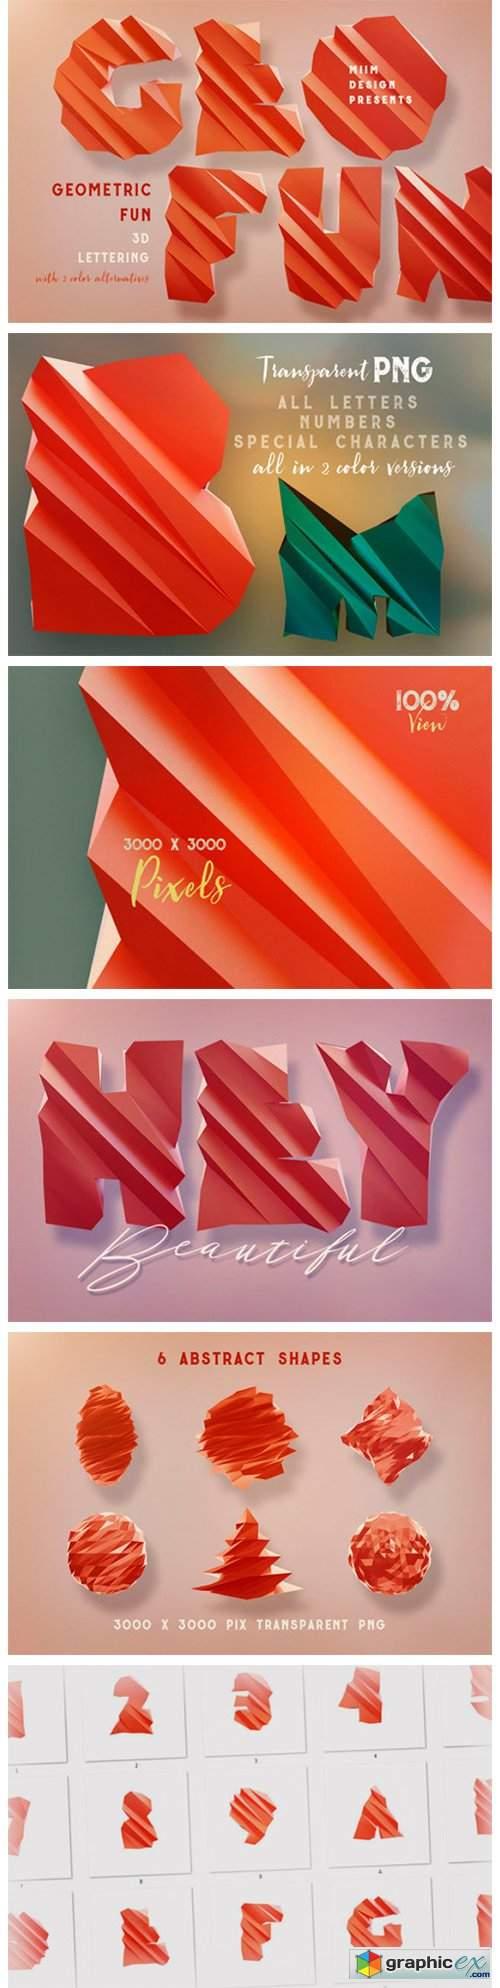 Geometric Fun – 3D Lettering